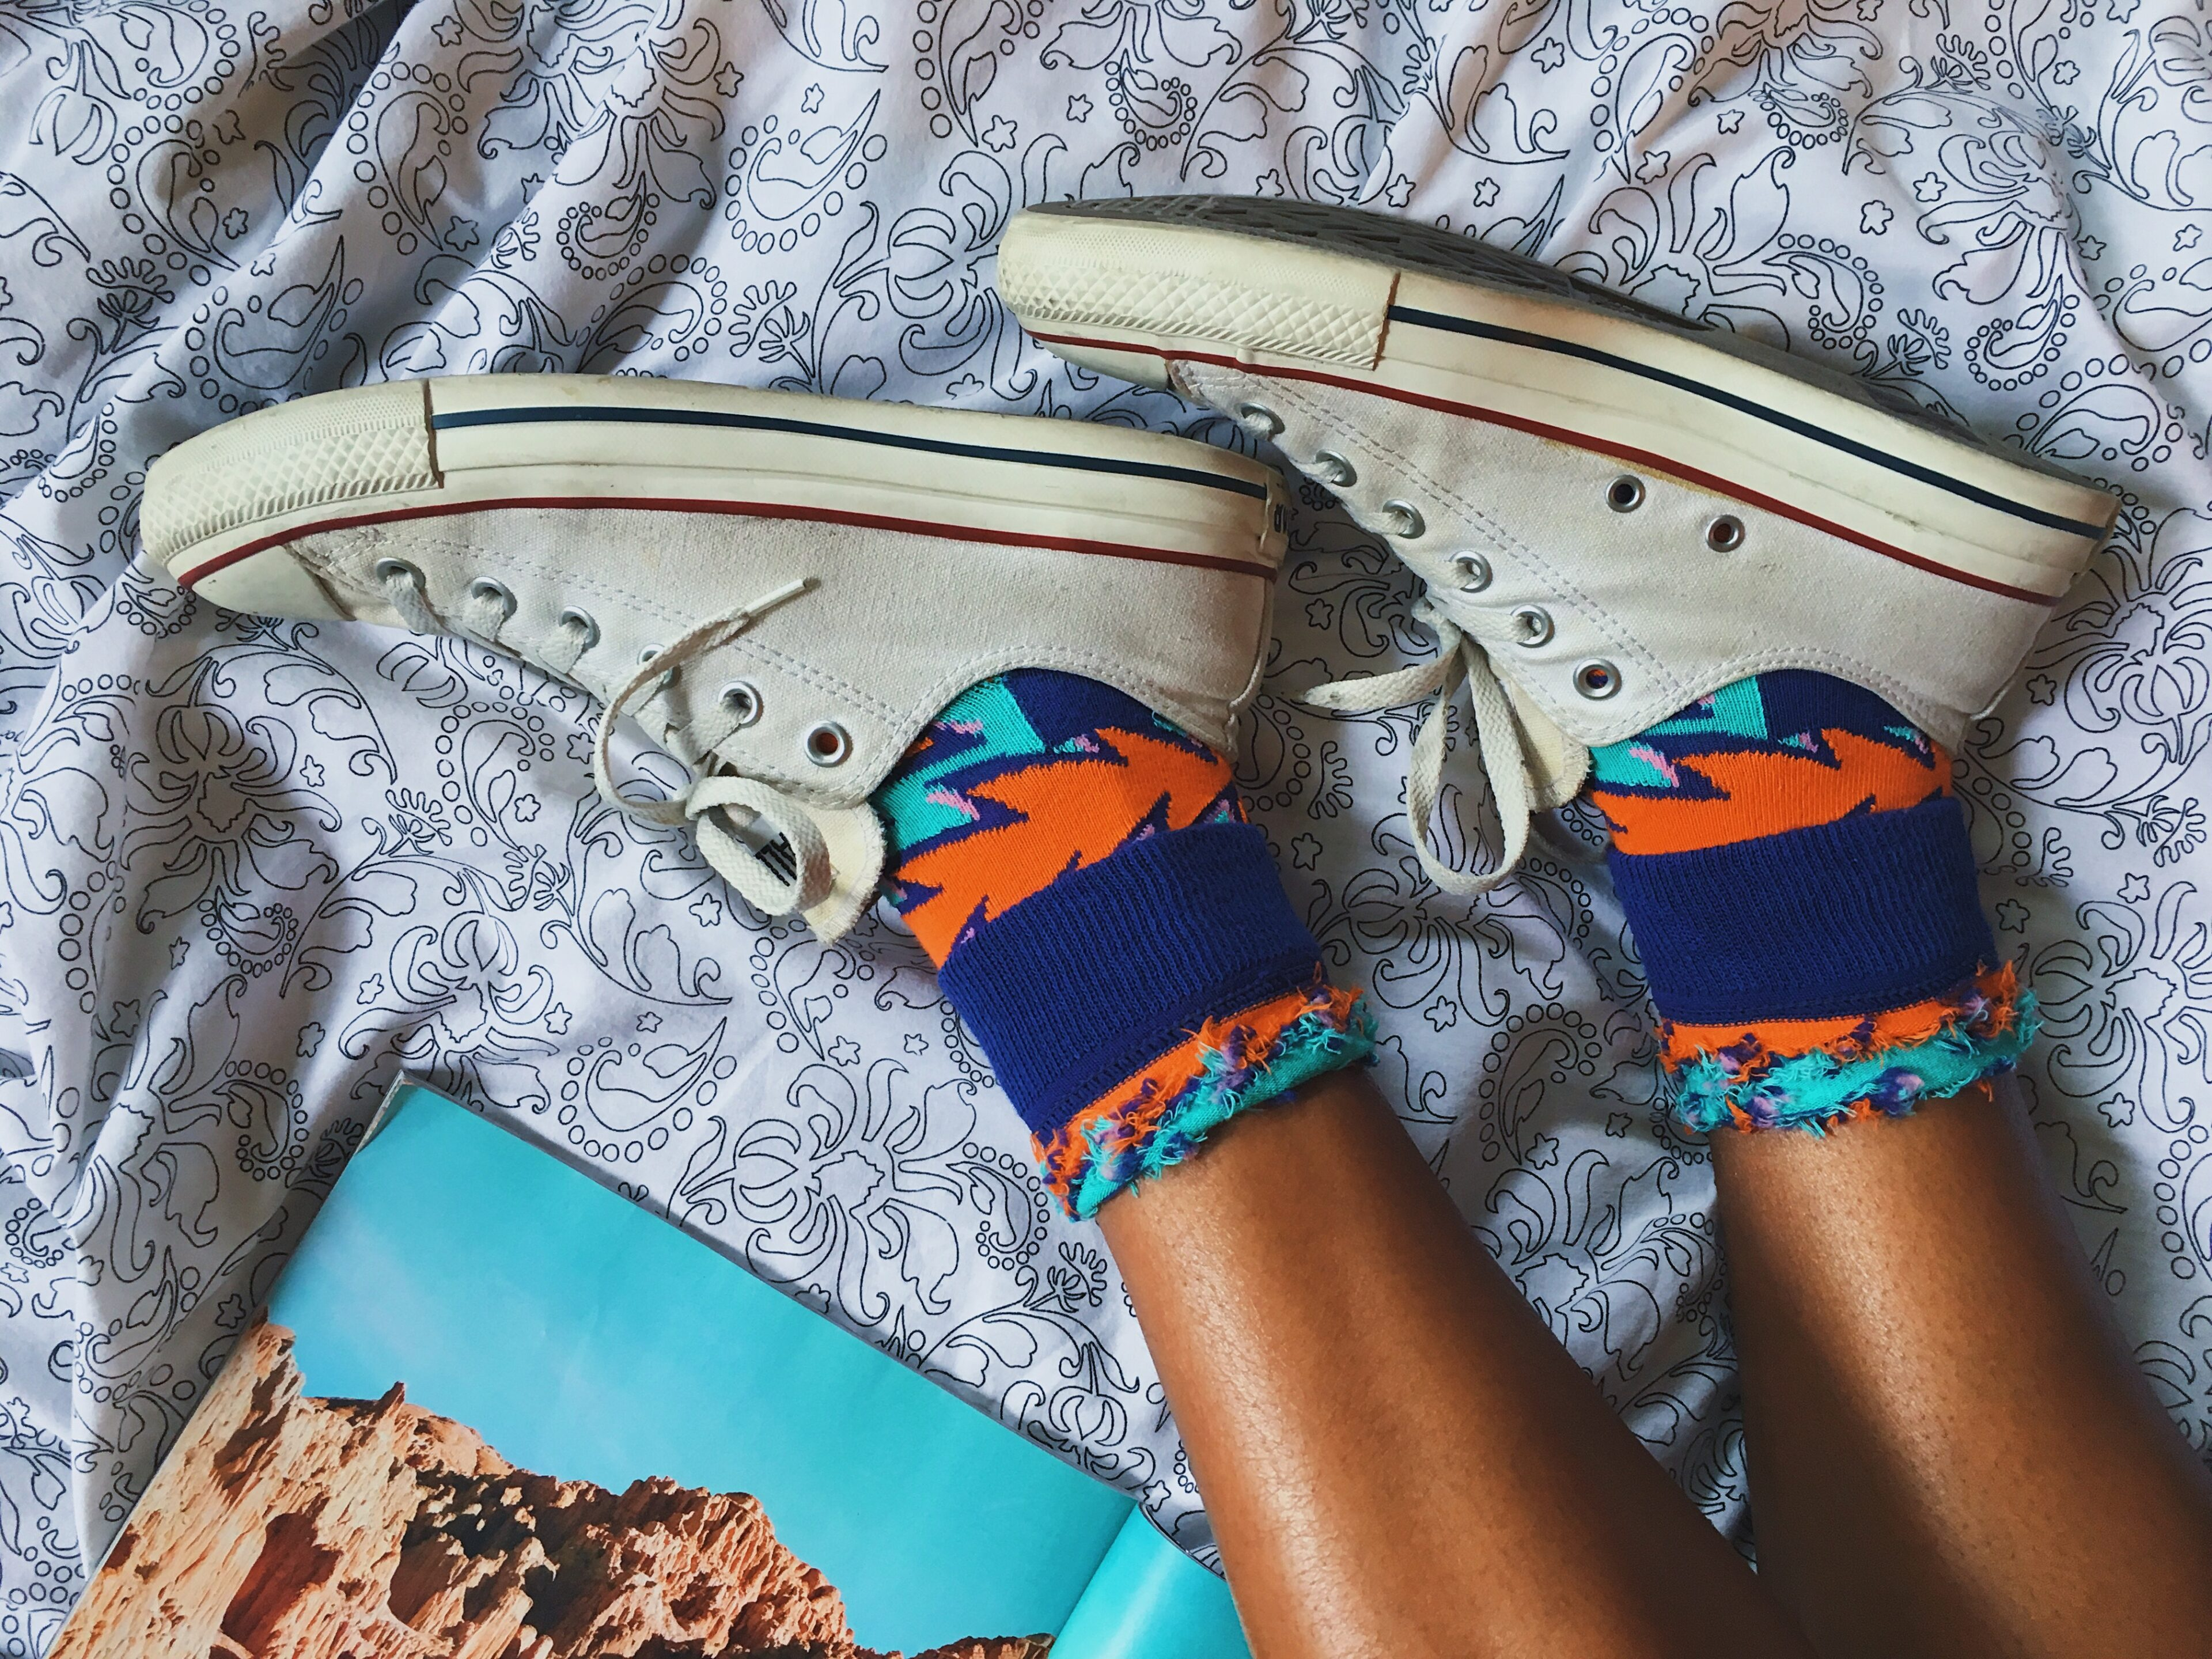 happy socks-chucks-converse-colorful socks-wear who you are-lcm